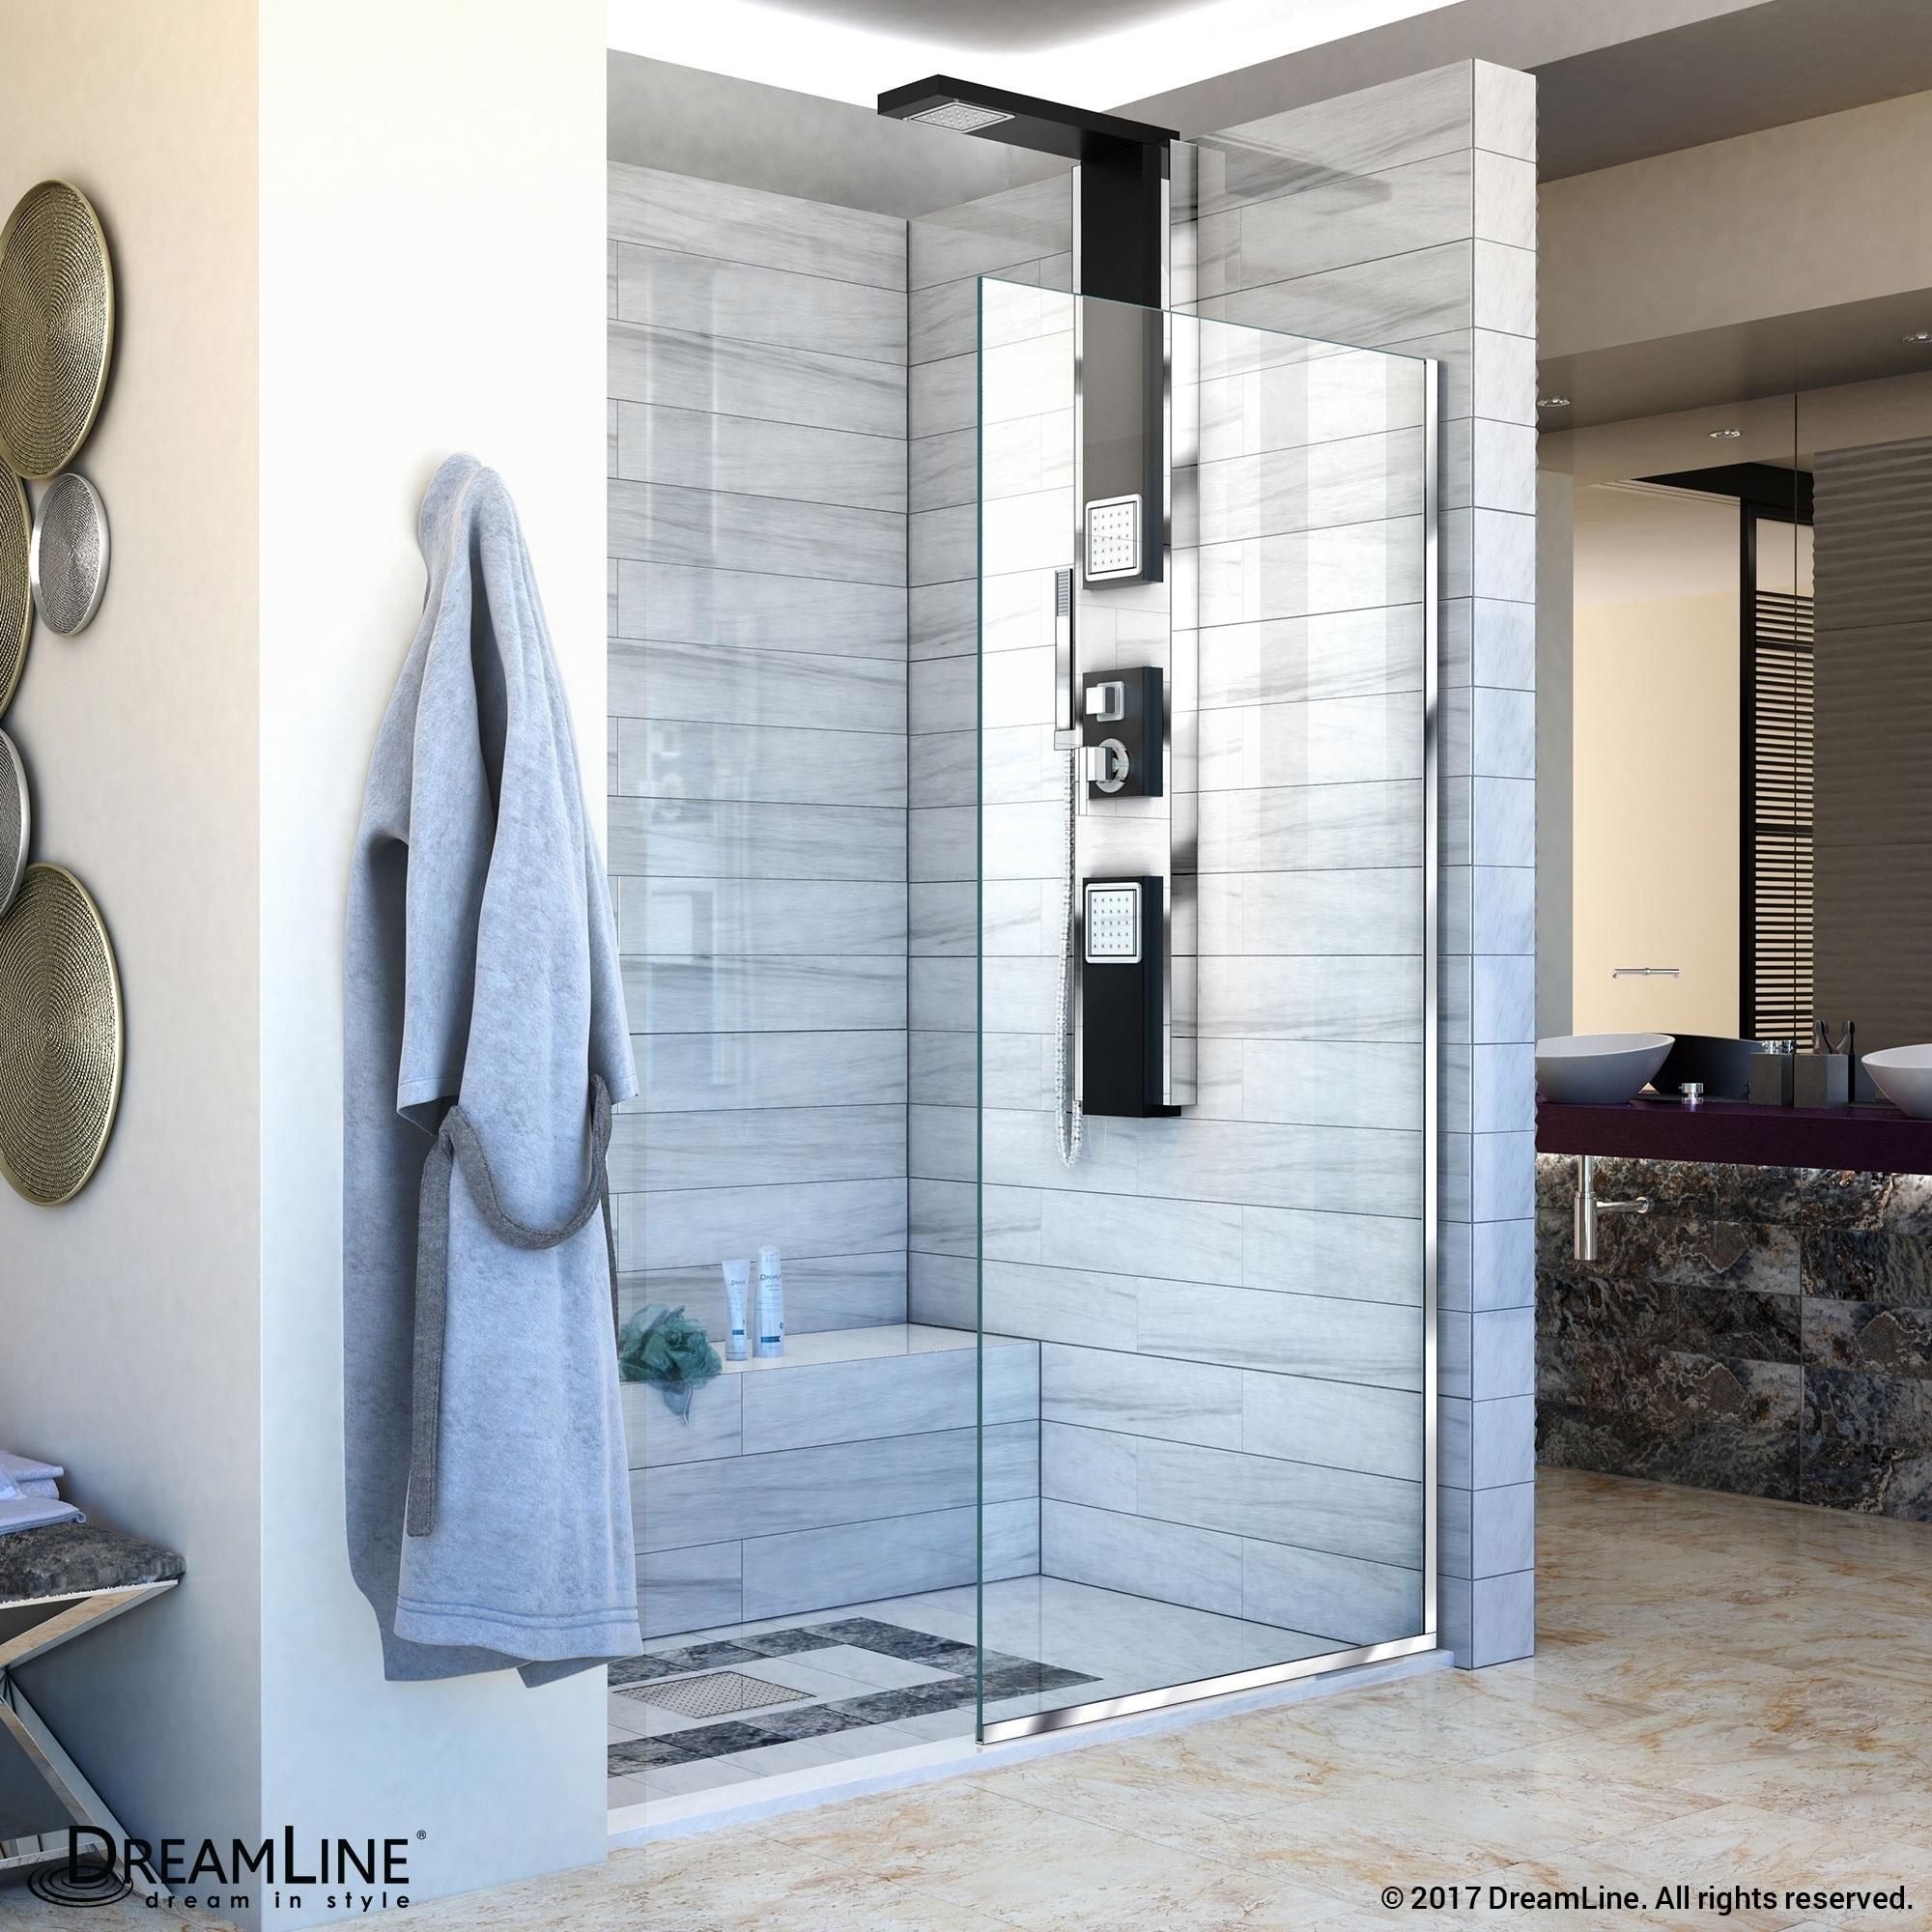 Shop Linea Frameless Shower Door 30 In X 72 In Open Entry Design